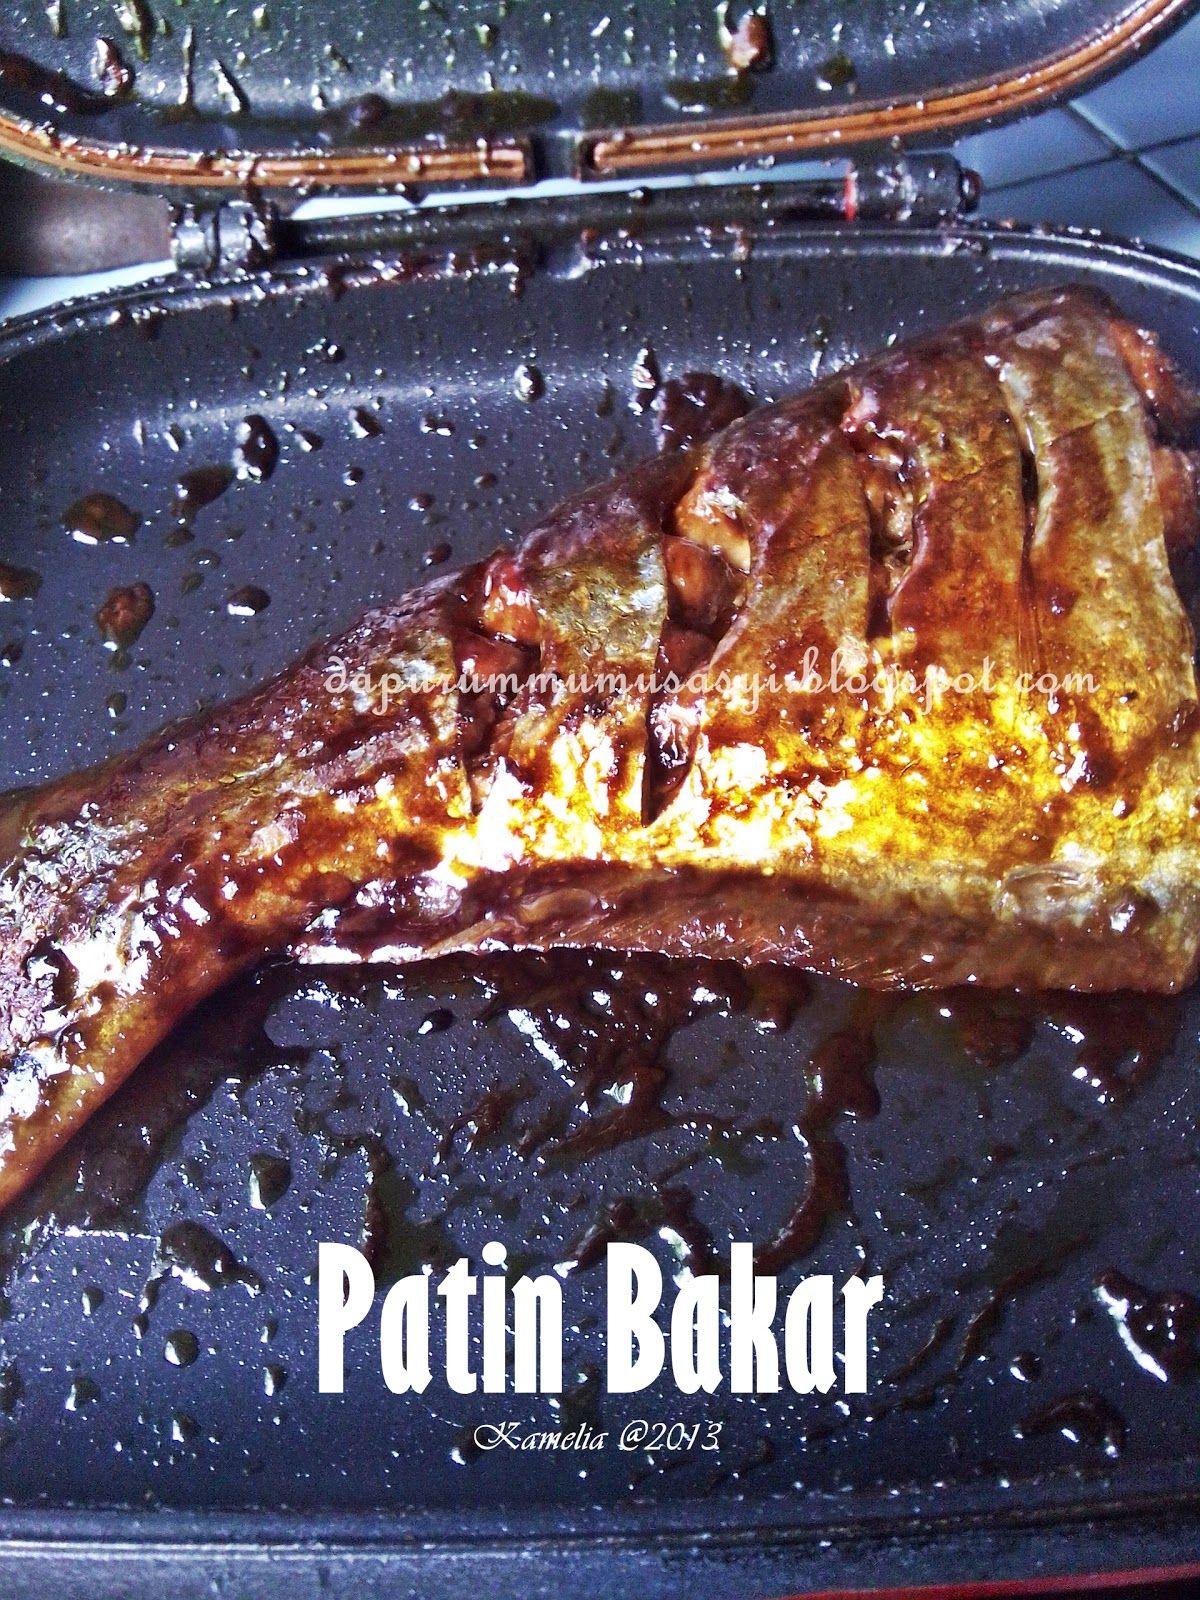 Ikan Patin Yang Dibakar Dengan Double Pan Happy Call Meskipun Ikannya Cukup Tebal Alhamdulillah Matang Sempurna Dan Bumbu Juga Mer Makanan Matang Ikan